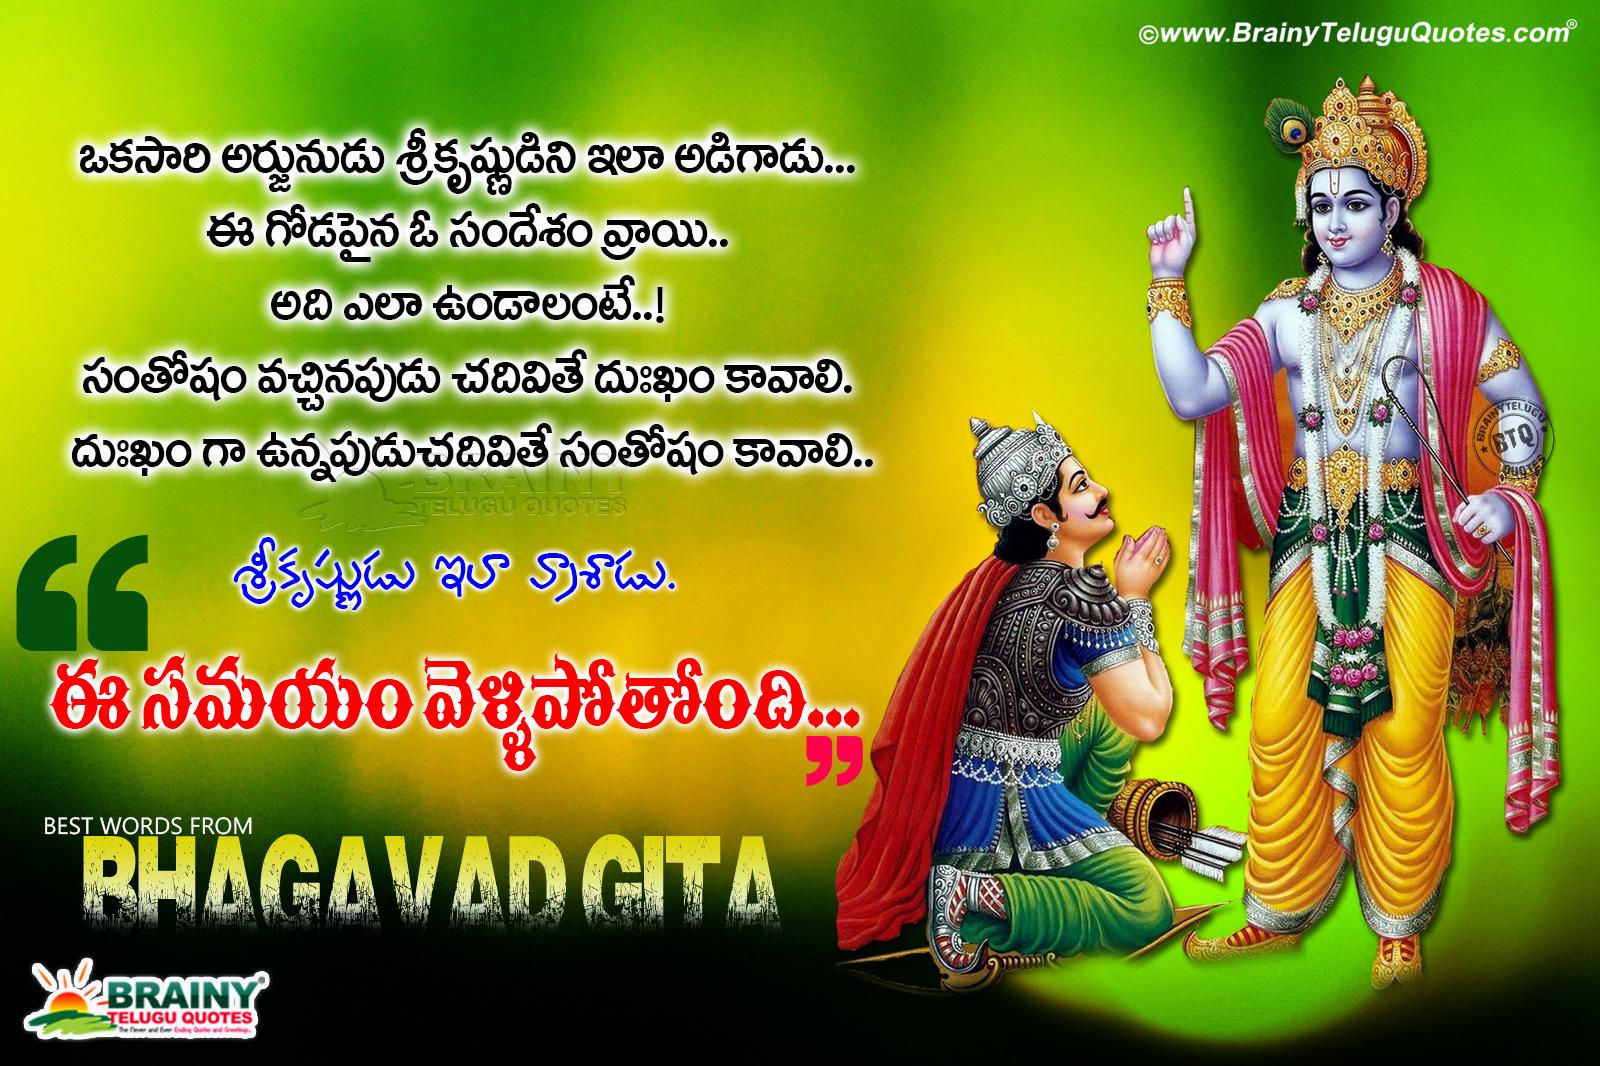 bhagavad gita quotes in telugu pdf free download